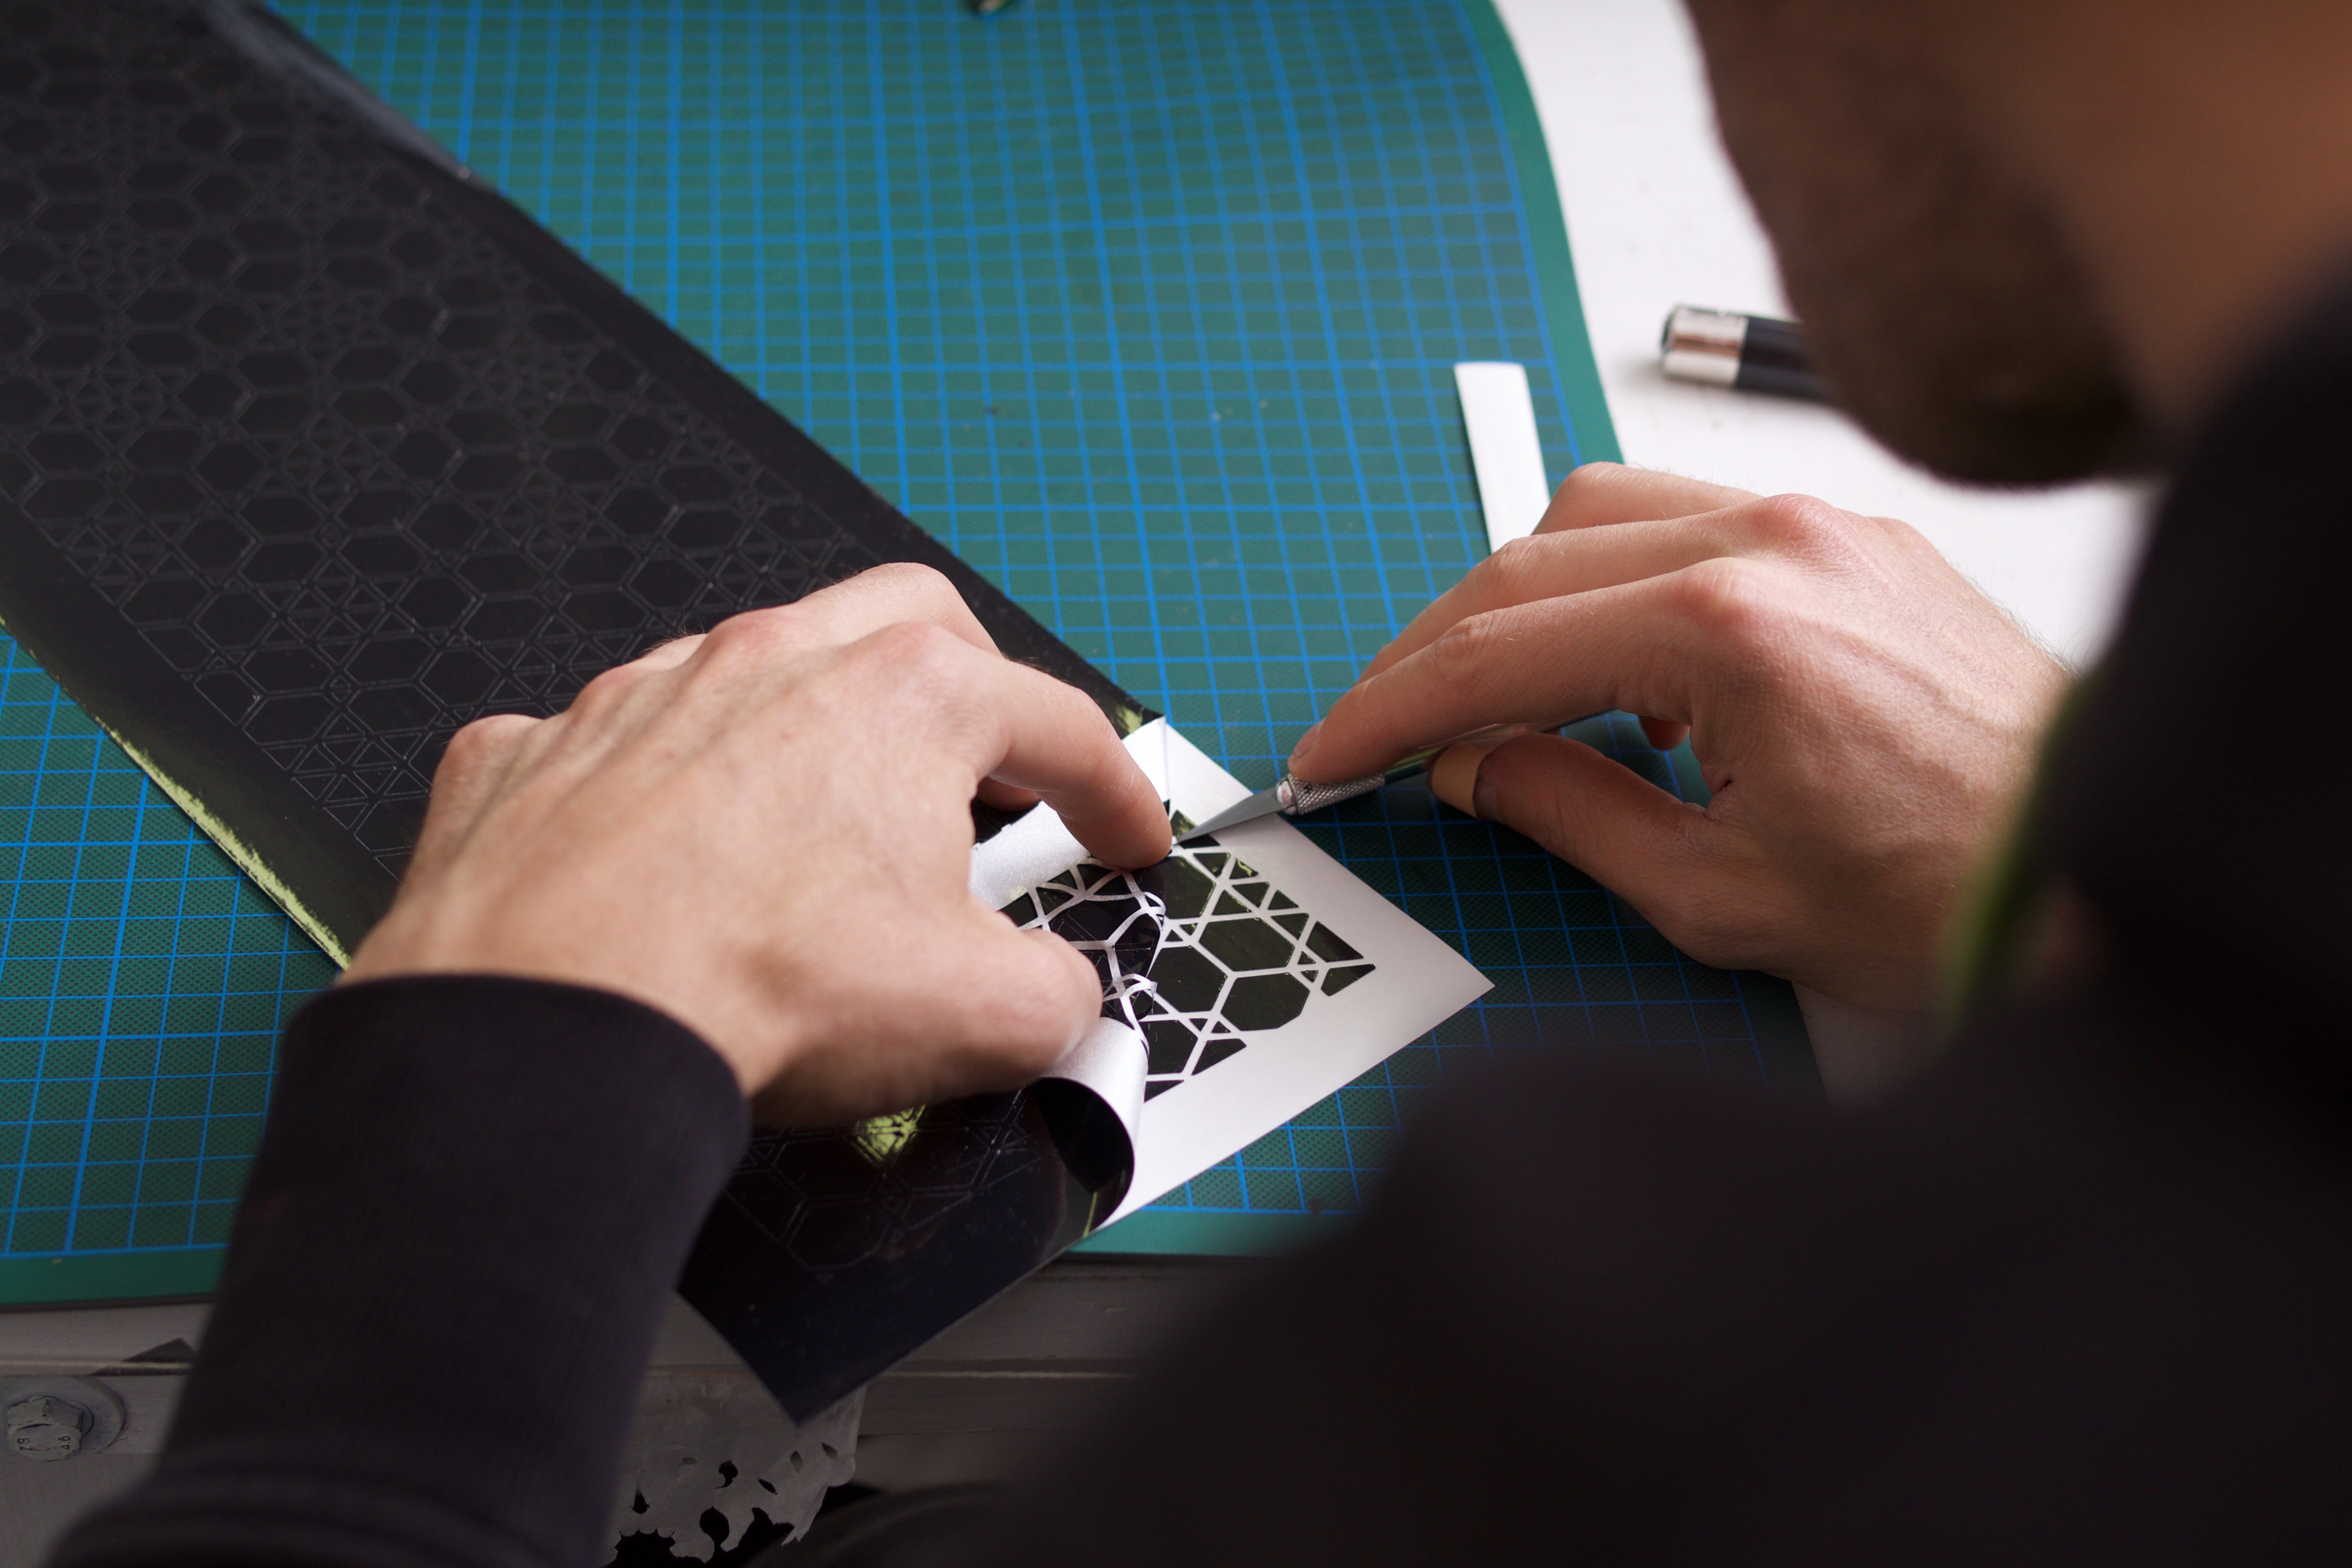 Stickerherstellung bei REFLECTIVE BERLIN